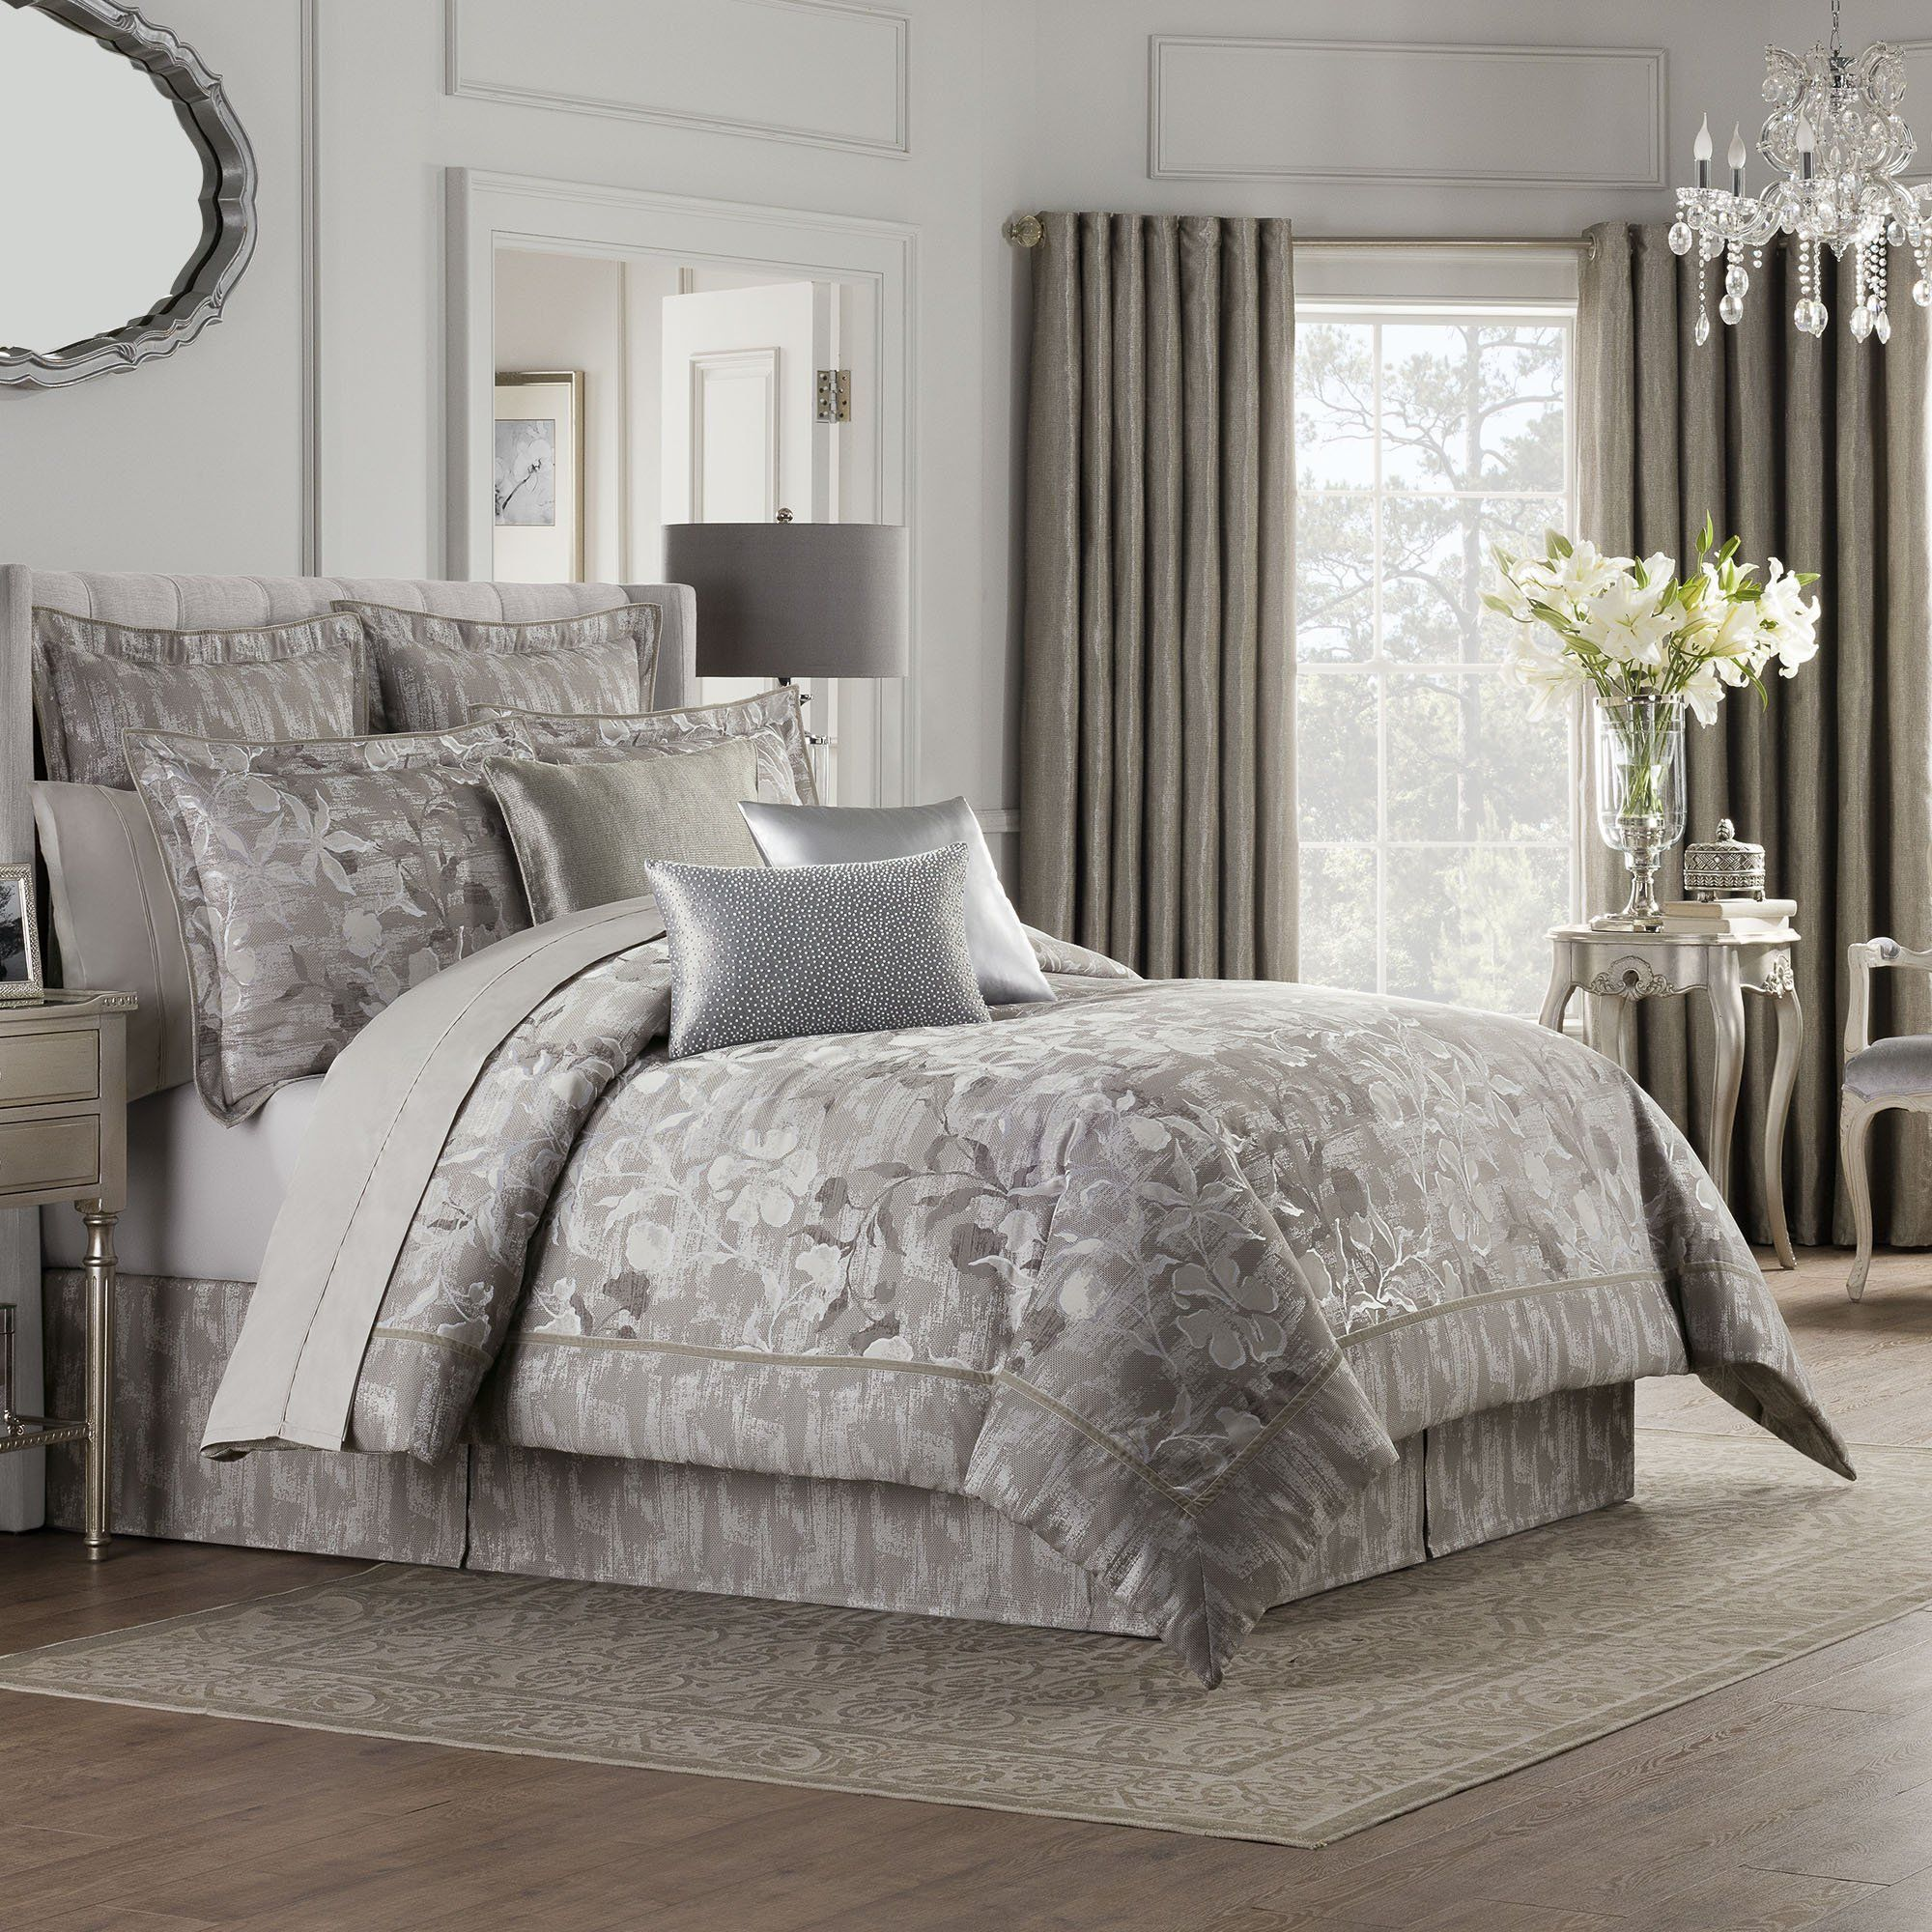 Valeron Fiesol Silver 4Piece Comforter Set in 2020